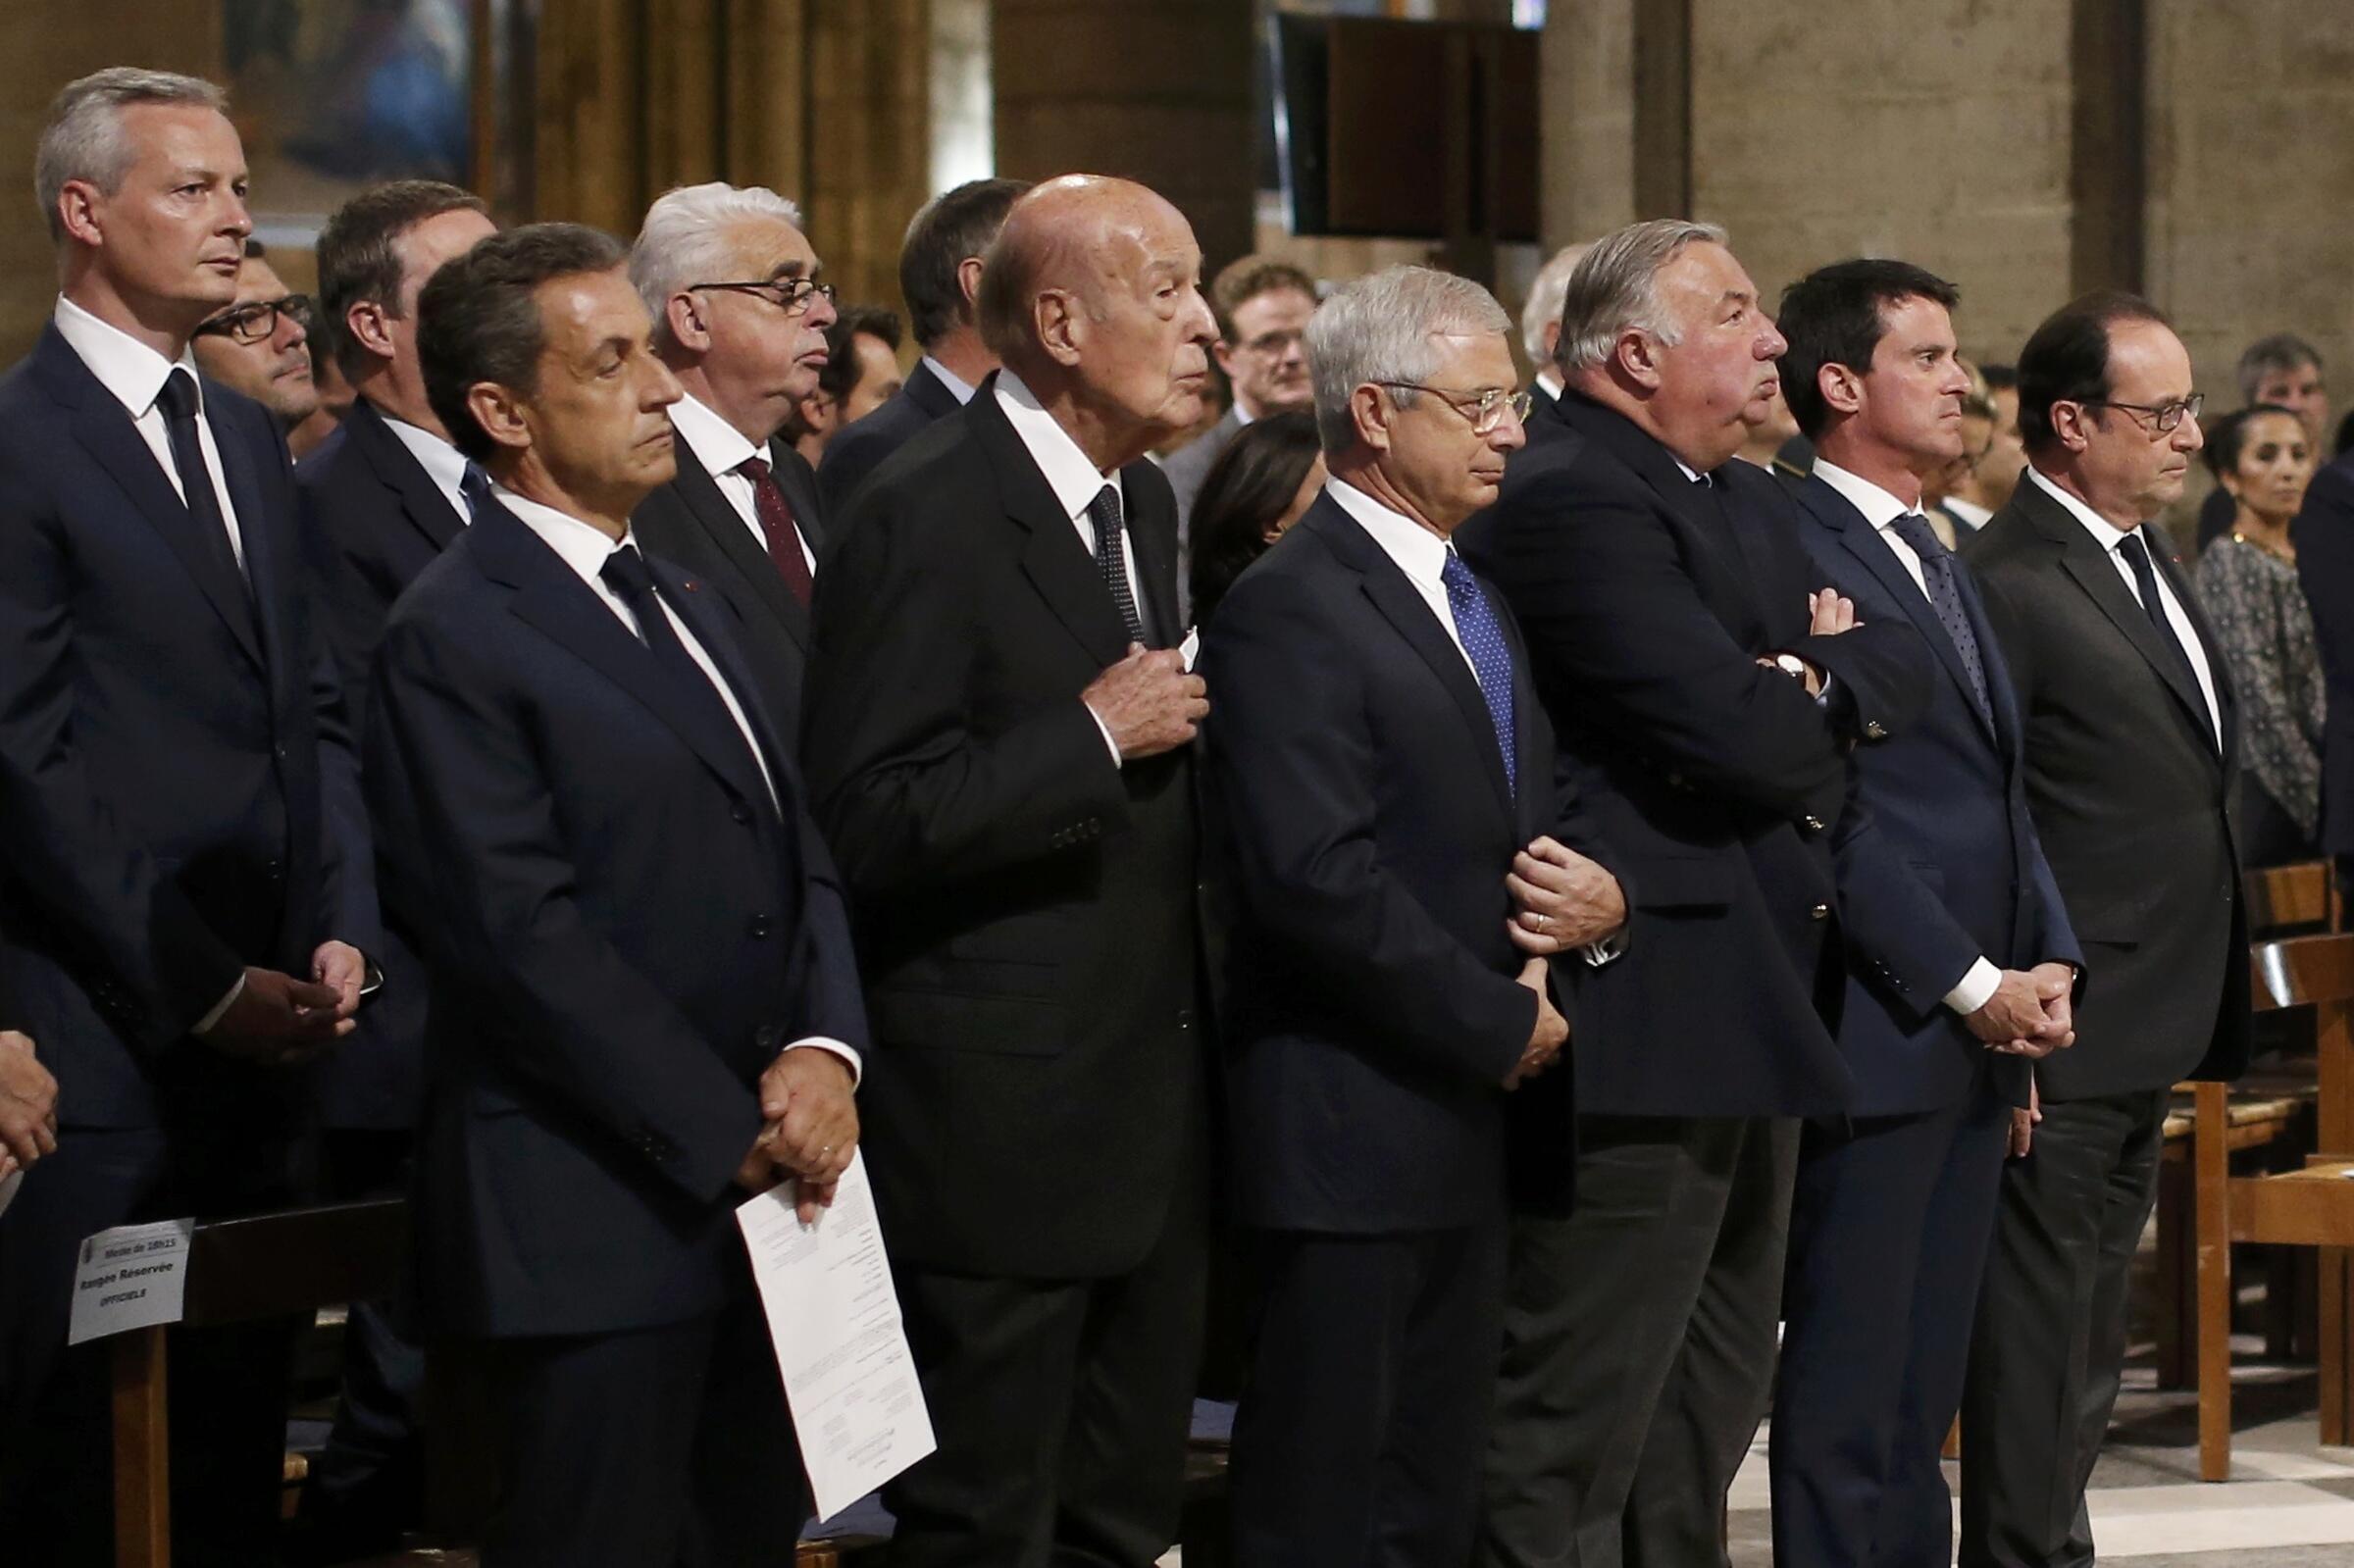 Kutoka kushoto kwenda kulia: Nicolas Sarkozy, Valéry Giscard d'Estaing, Claude Bartolone, Gérard Larcher, Manuel Valls et François Hollande katika kanisa la Notre-Dame mjini Paris, Jumatano Julai 27.